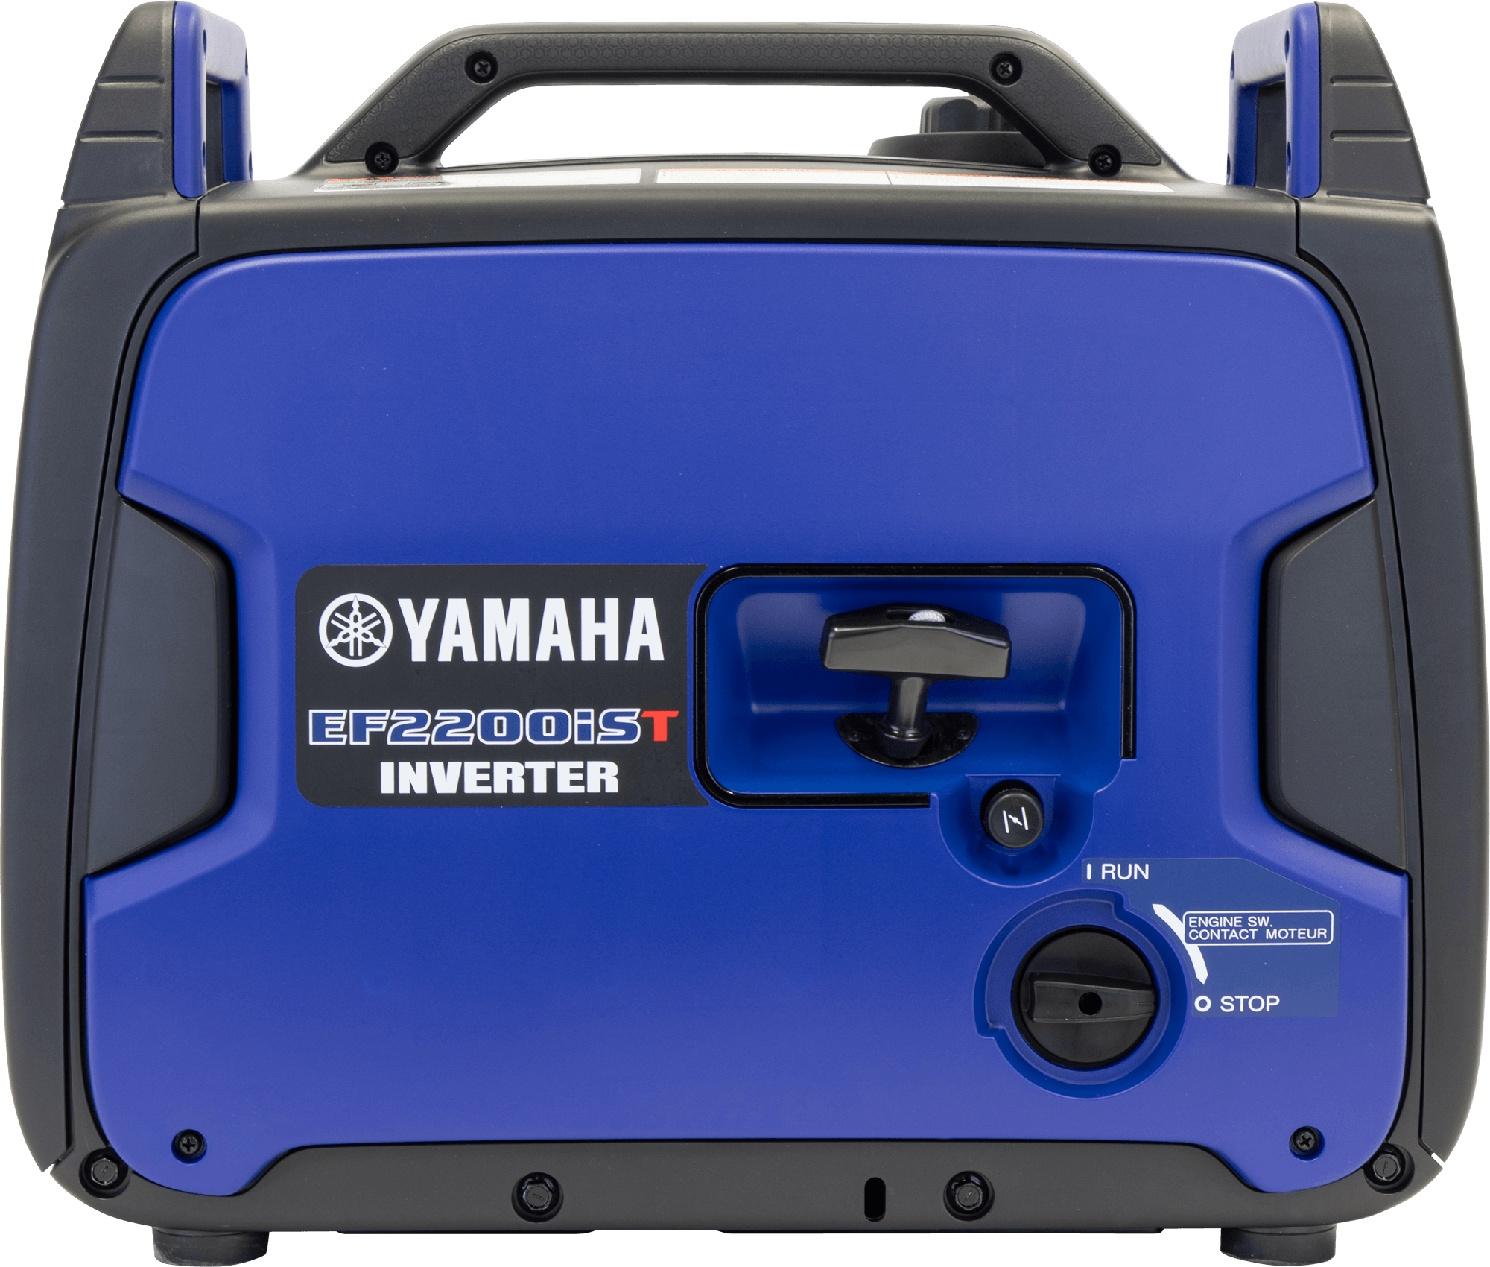 2021 Yamaha EF2200IST Blue